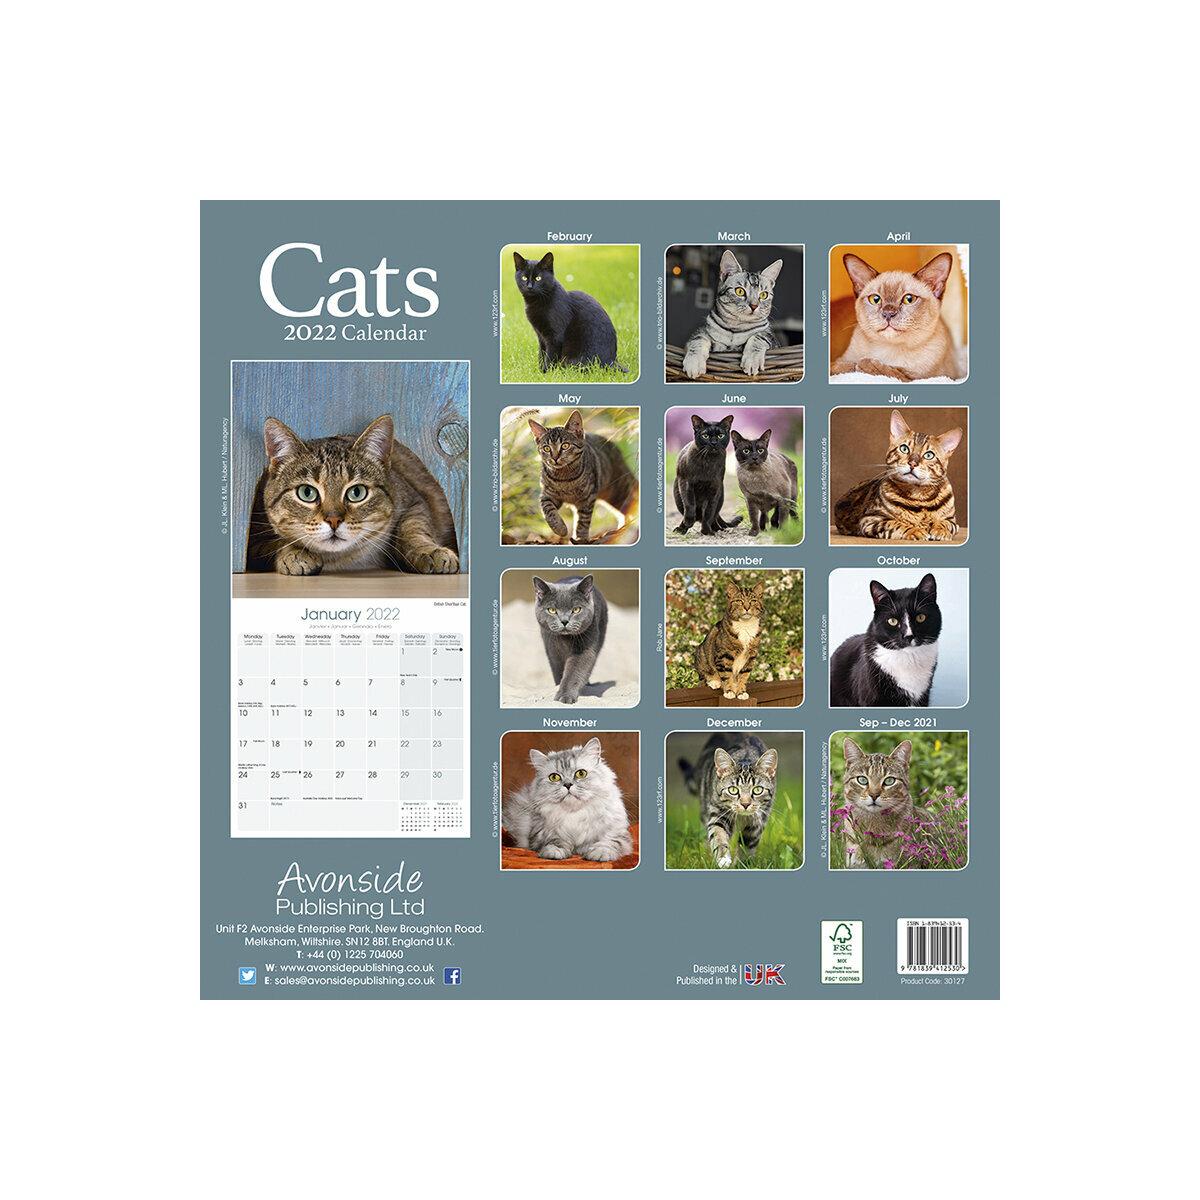 Calendrier 2022 Chat calendrier chats toutes couleurs 2022